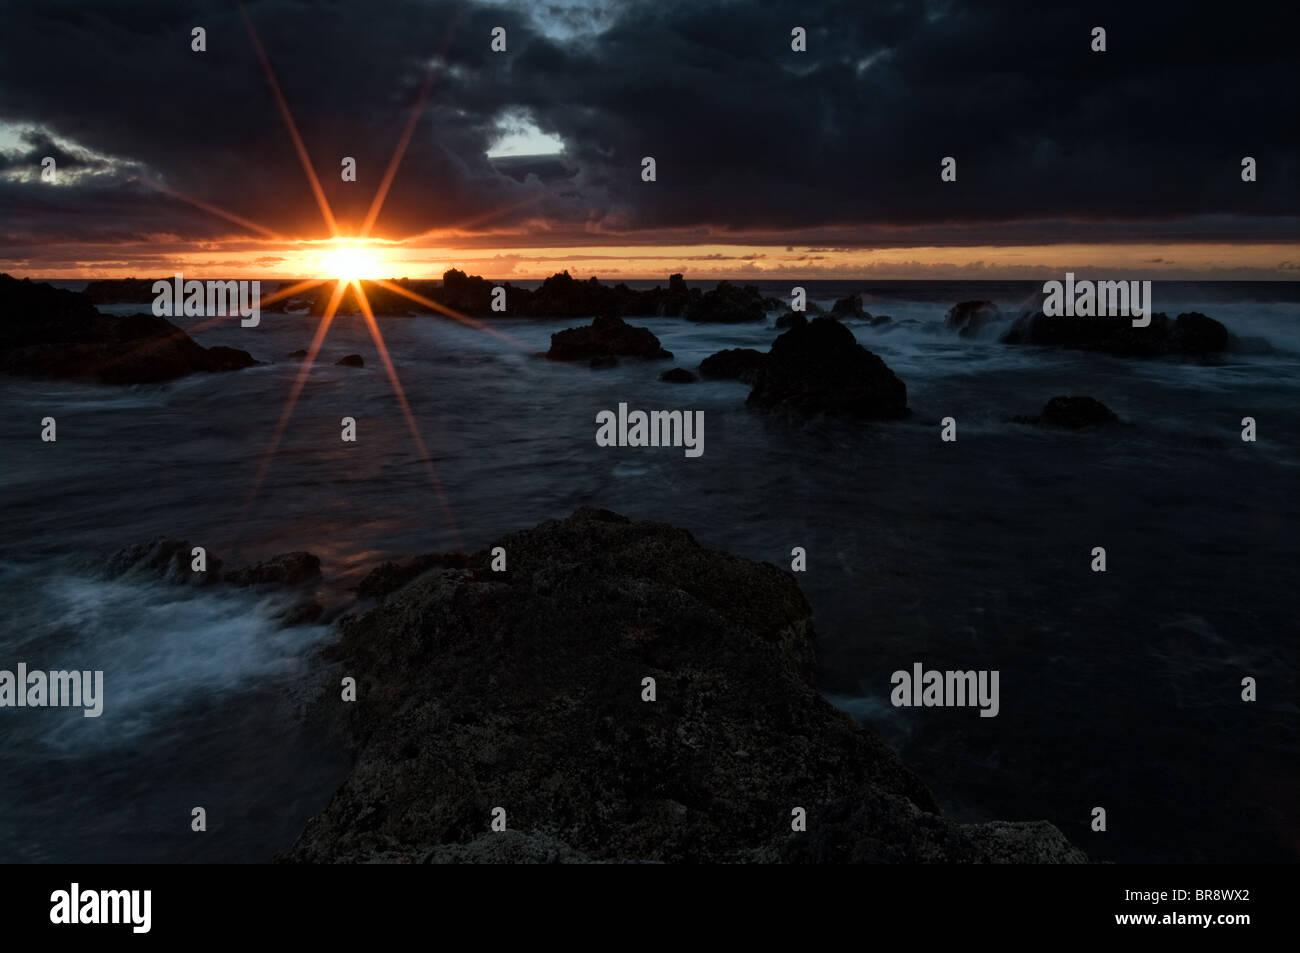 Sunset / sunrise by the sea Stock Photo